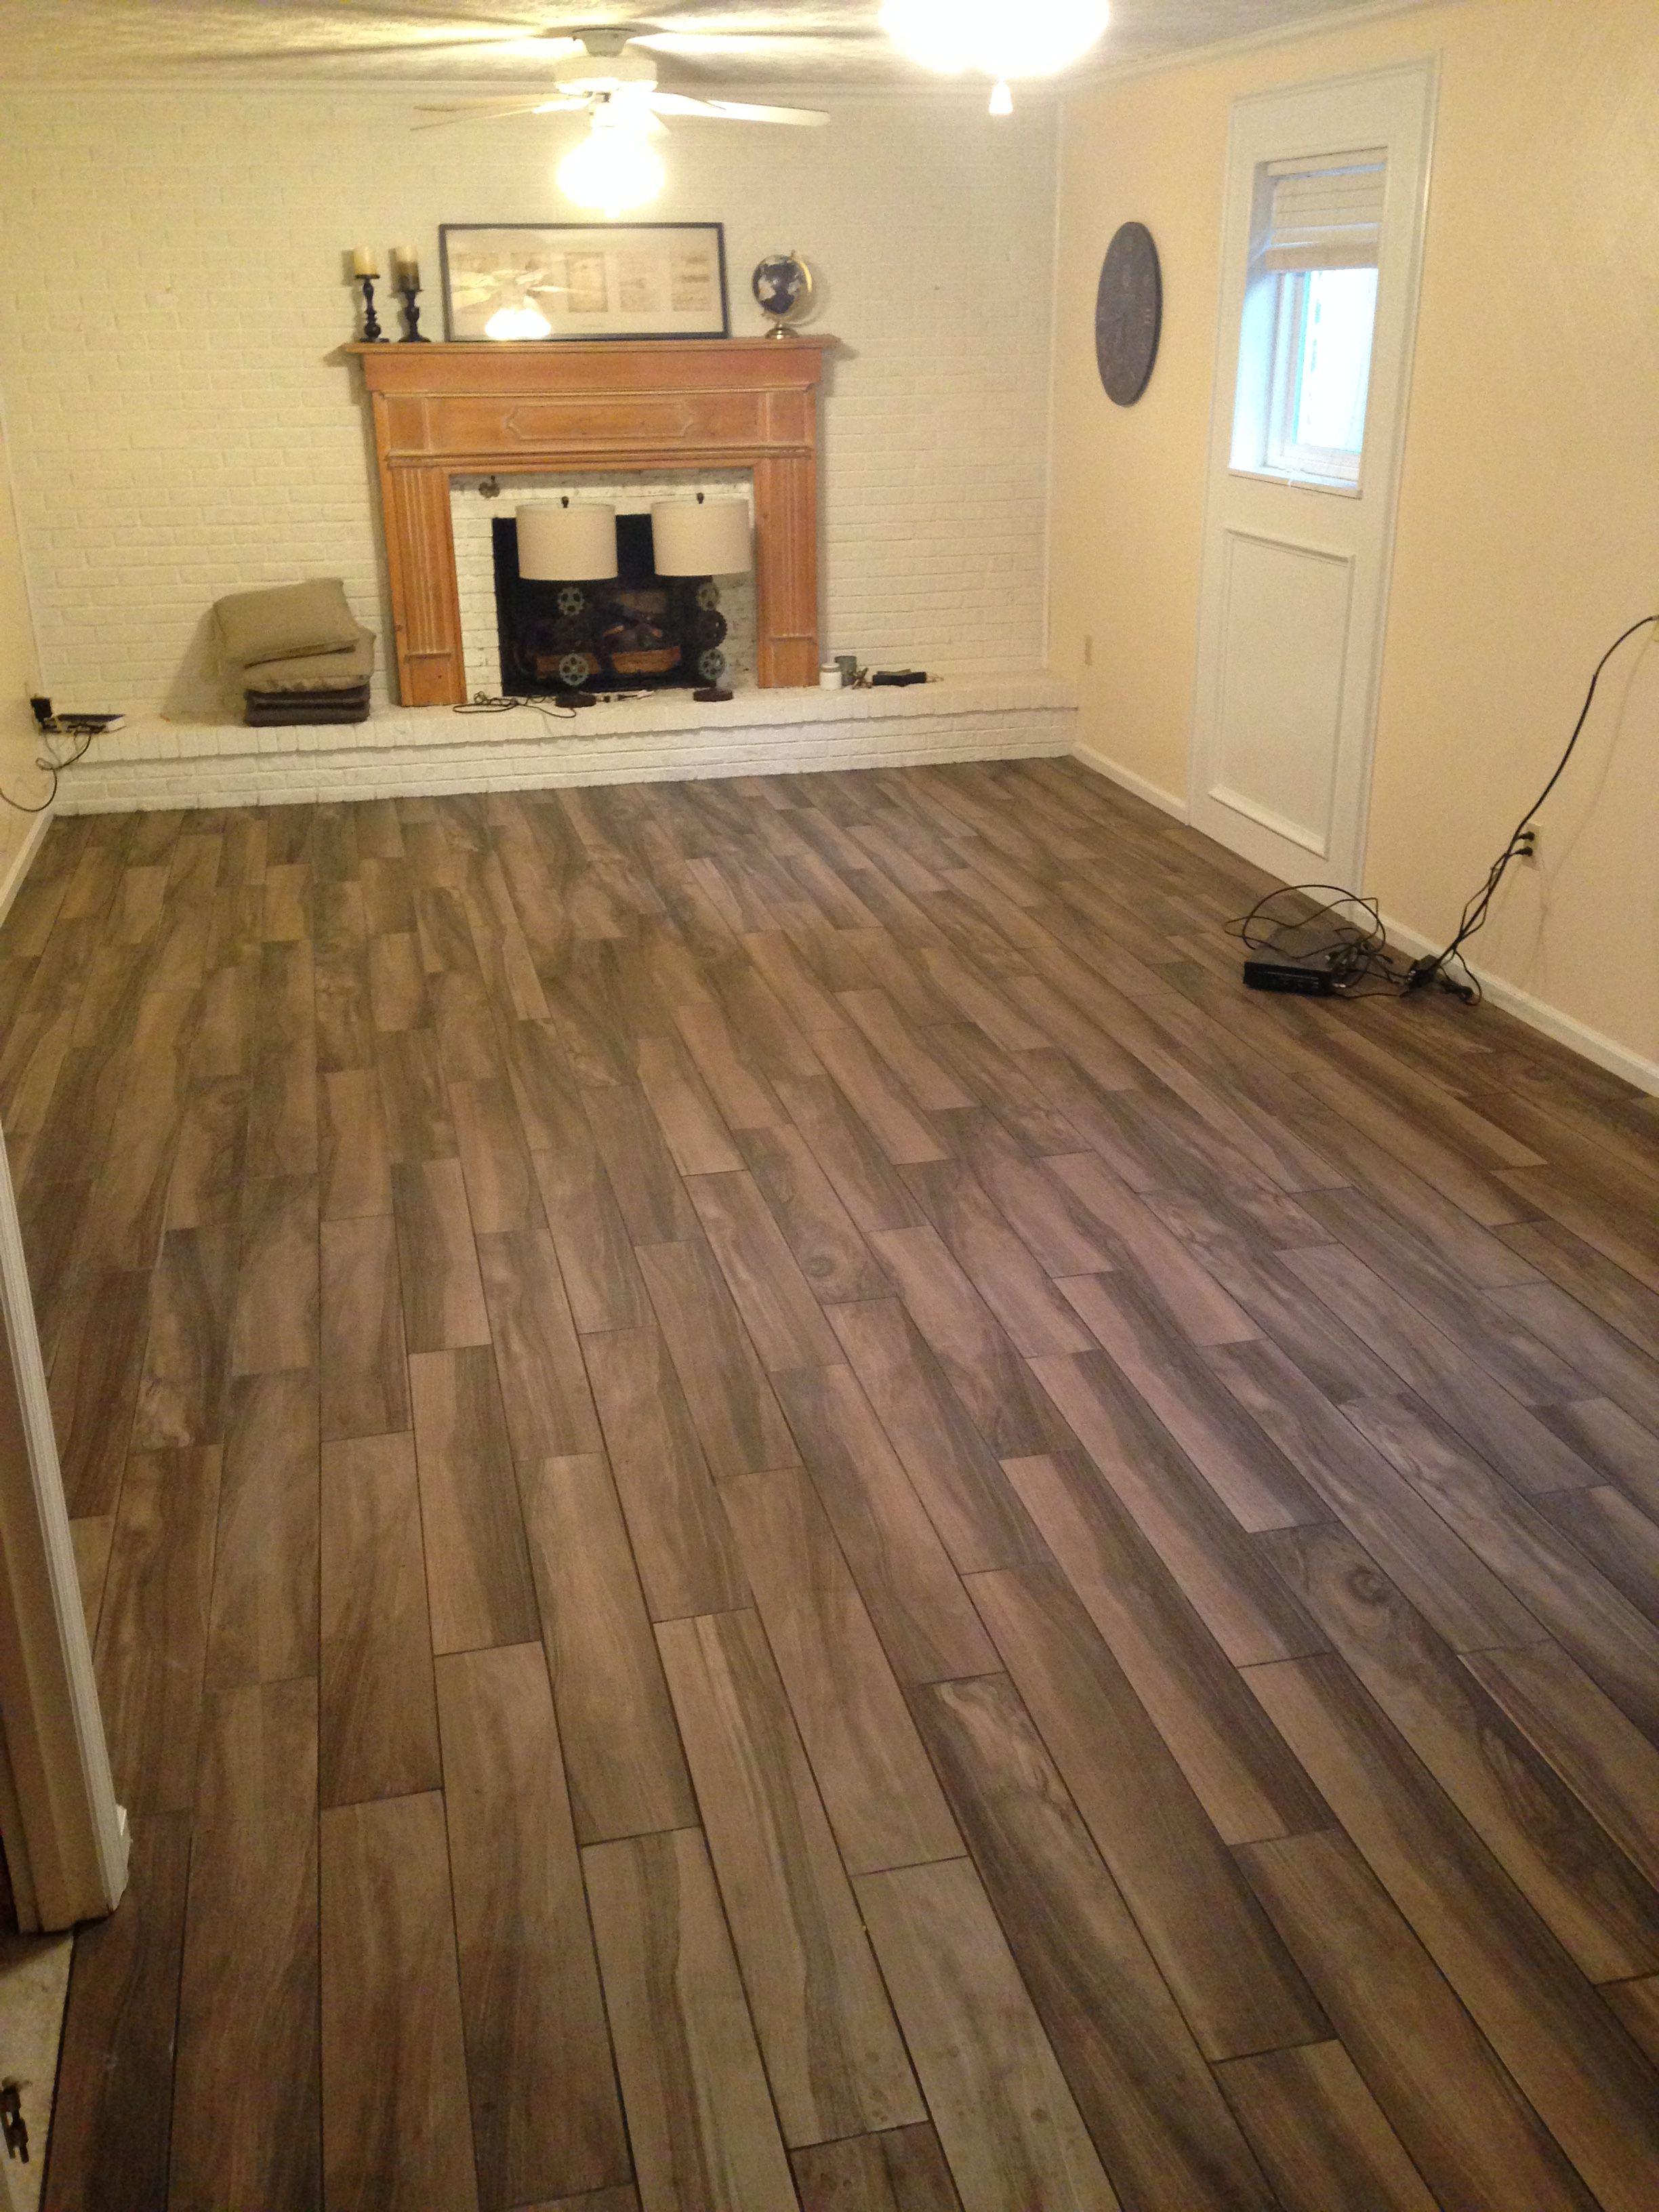 Hardwood Floor Tile Lowes Walesfootprint Org